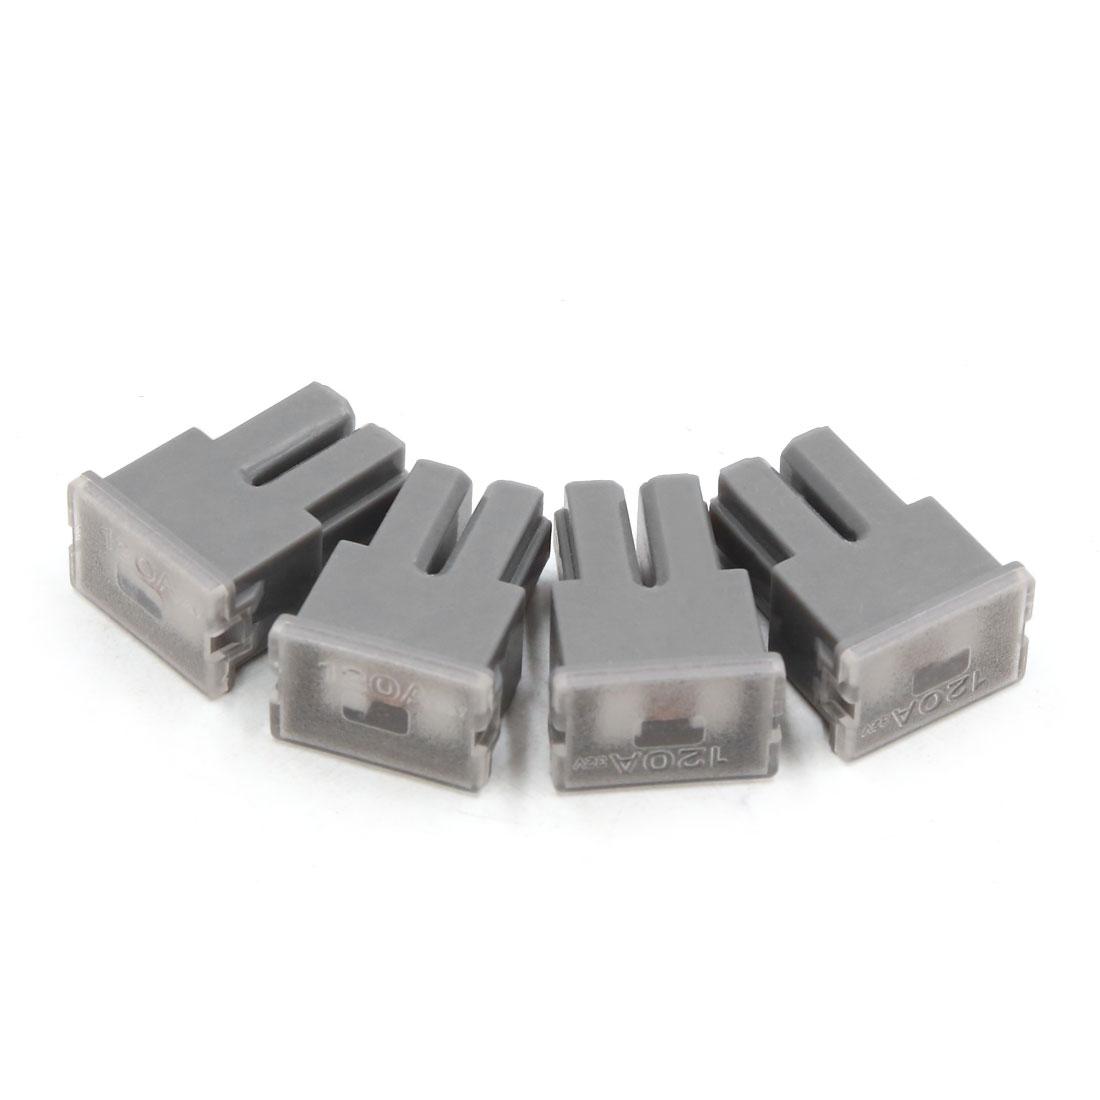 4pcs 32V 120A Gray Plastic Casing Female PAL Cartridge Fuse for Auto Car Vehicle